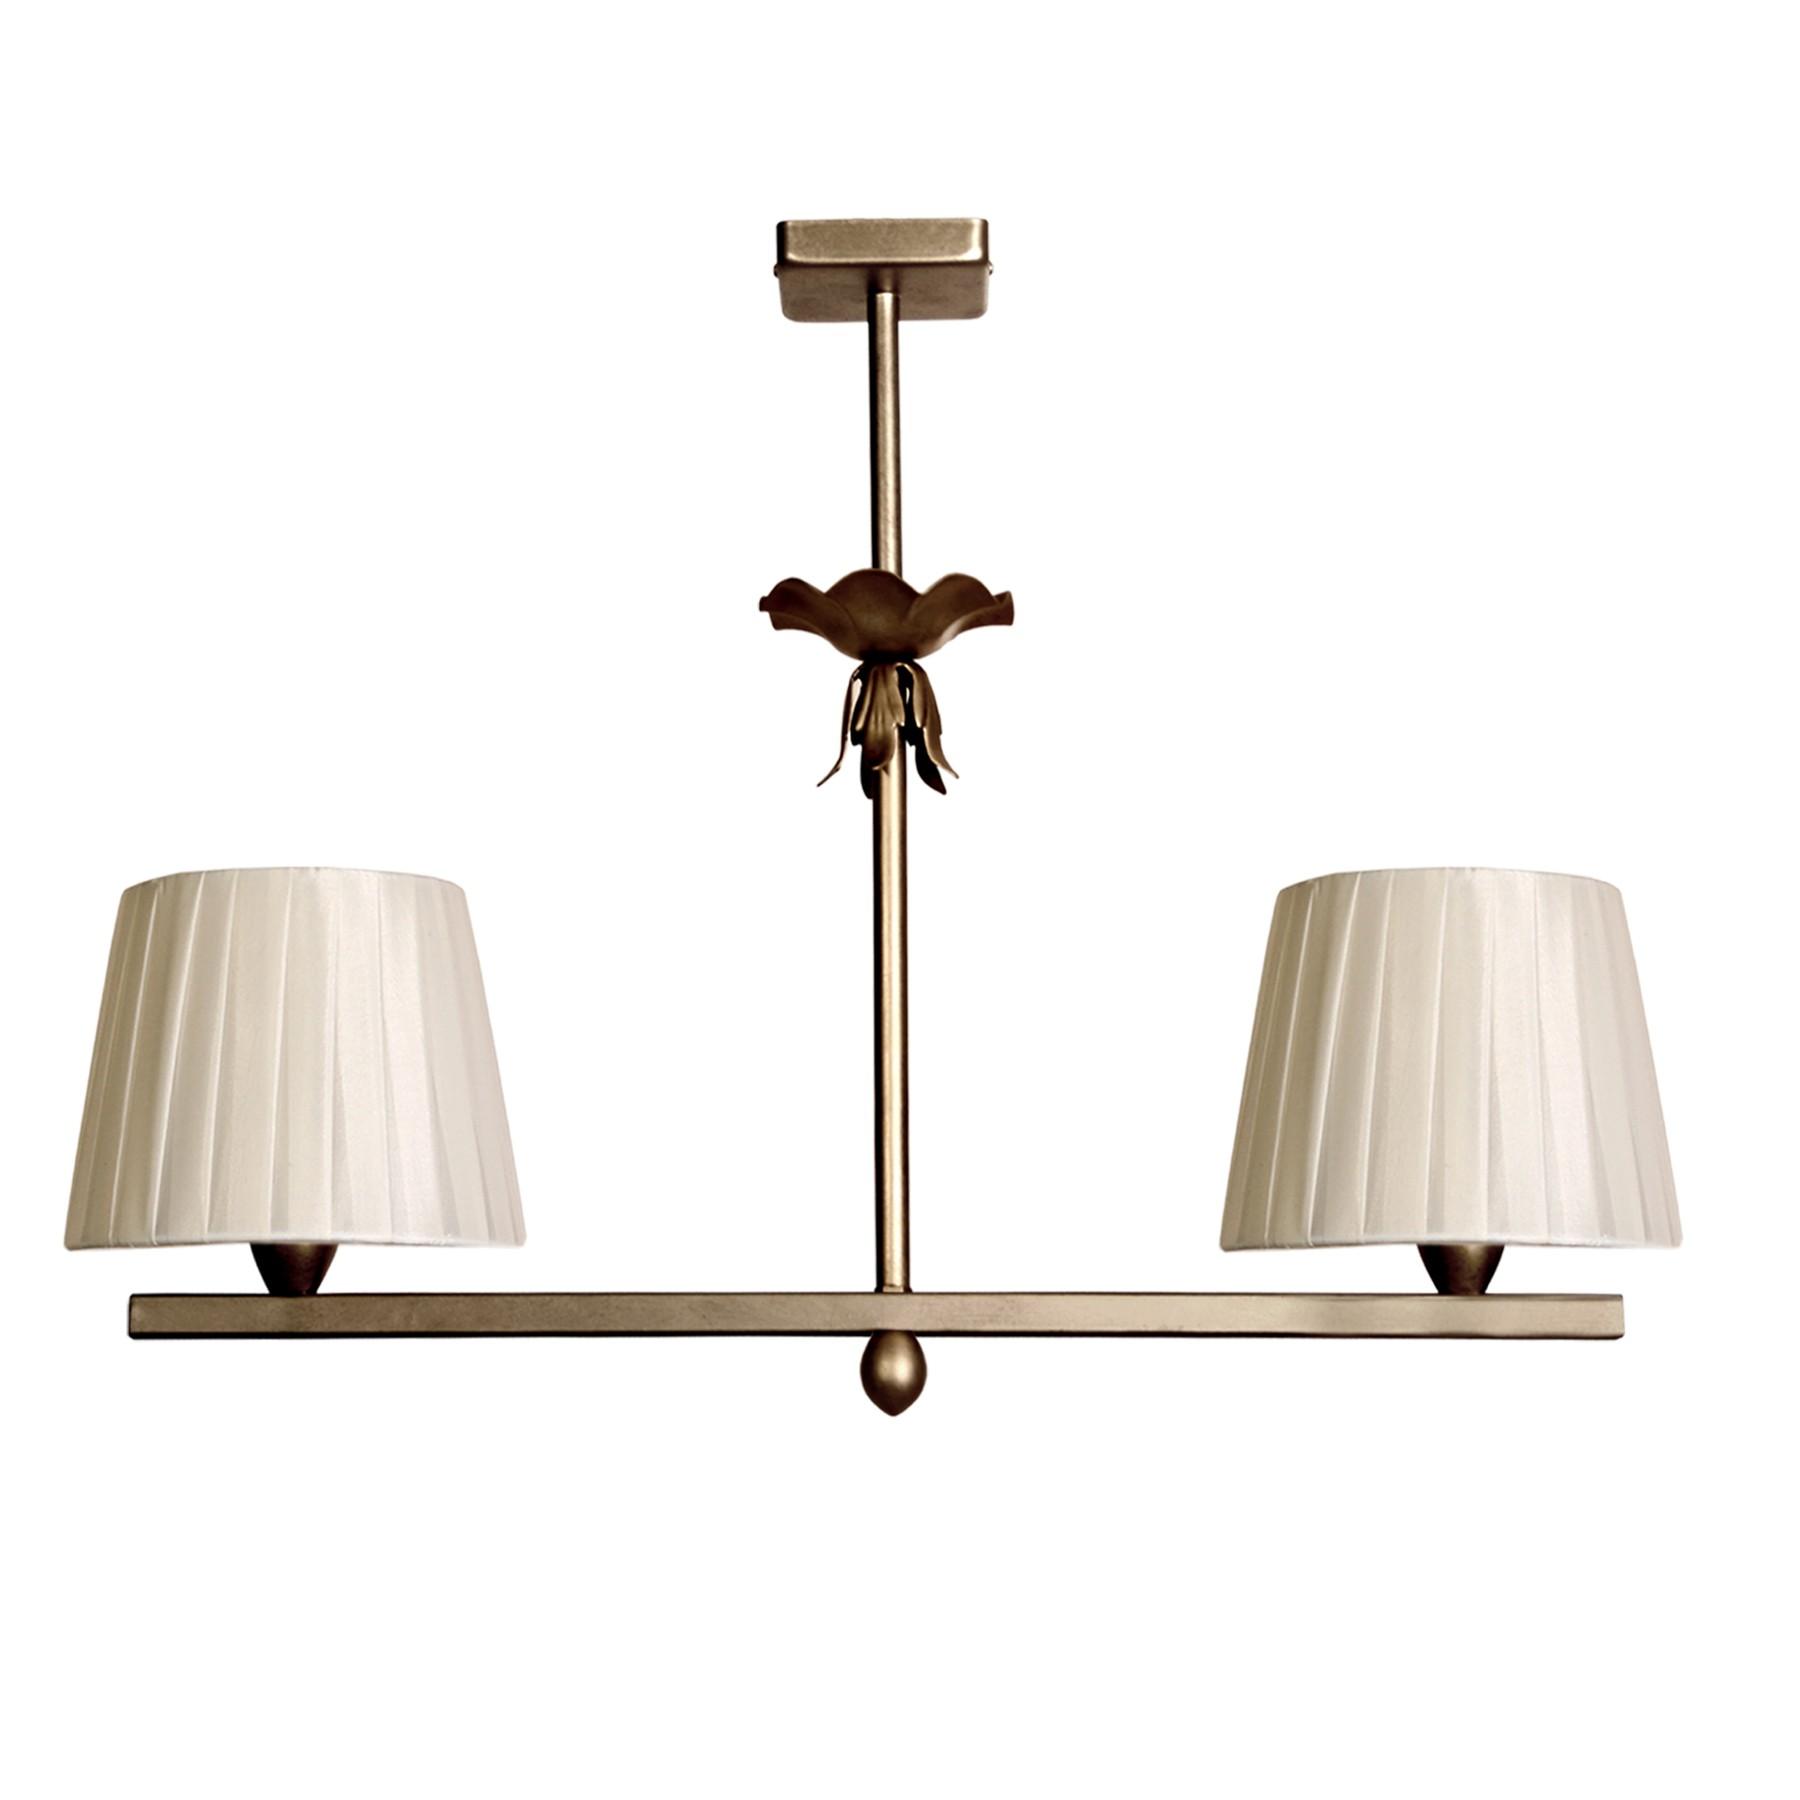 Lámpara de techo clásica modelo Min 2C de dos lámparas